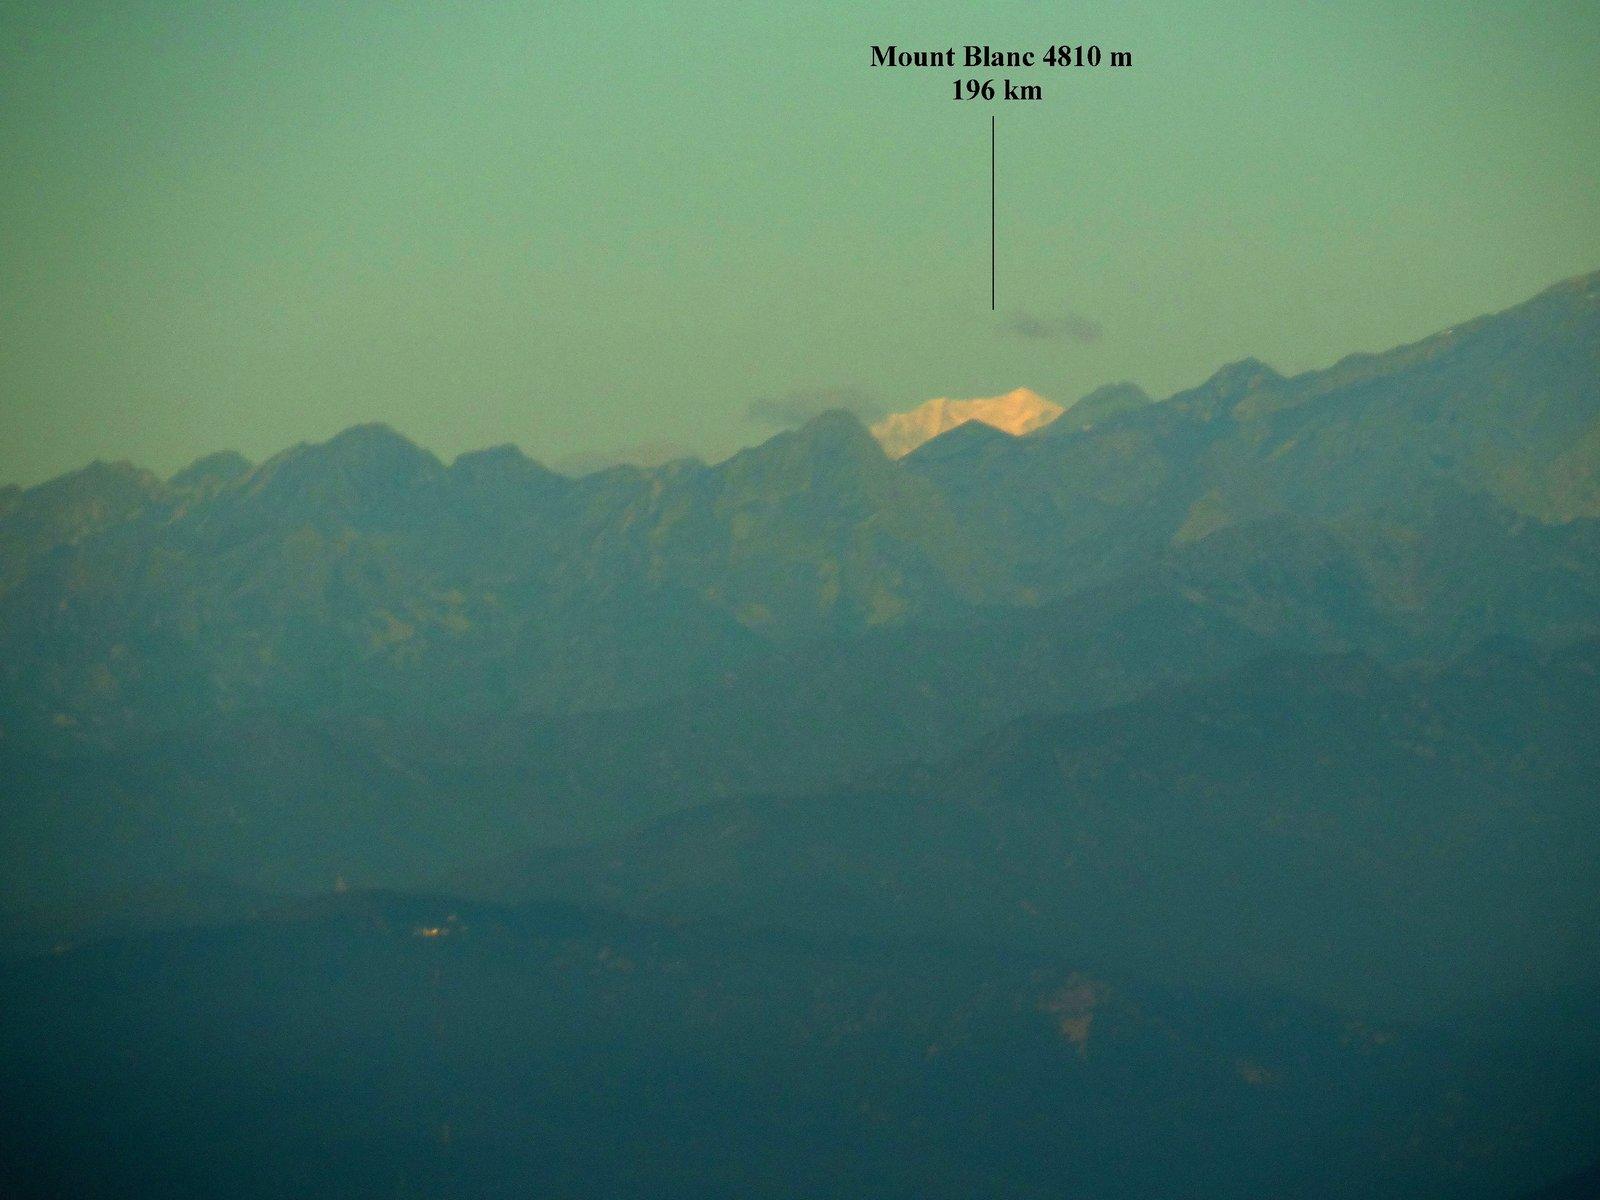 2 Mount Blanc.JPG